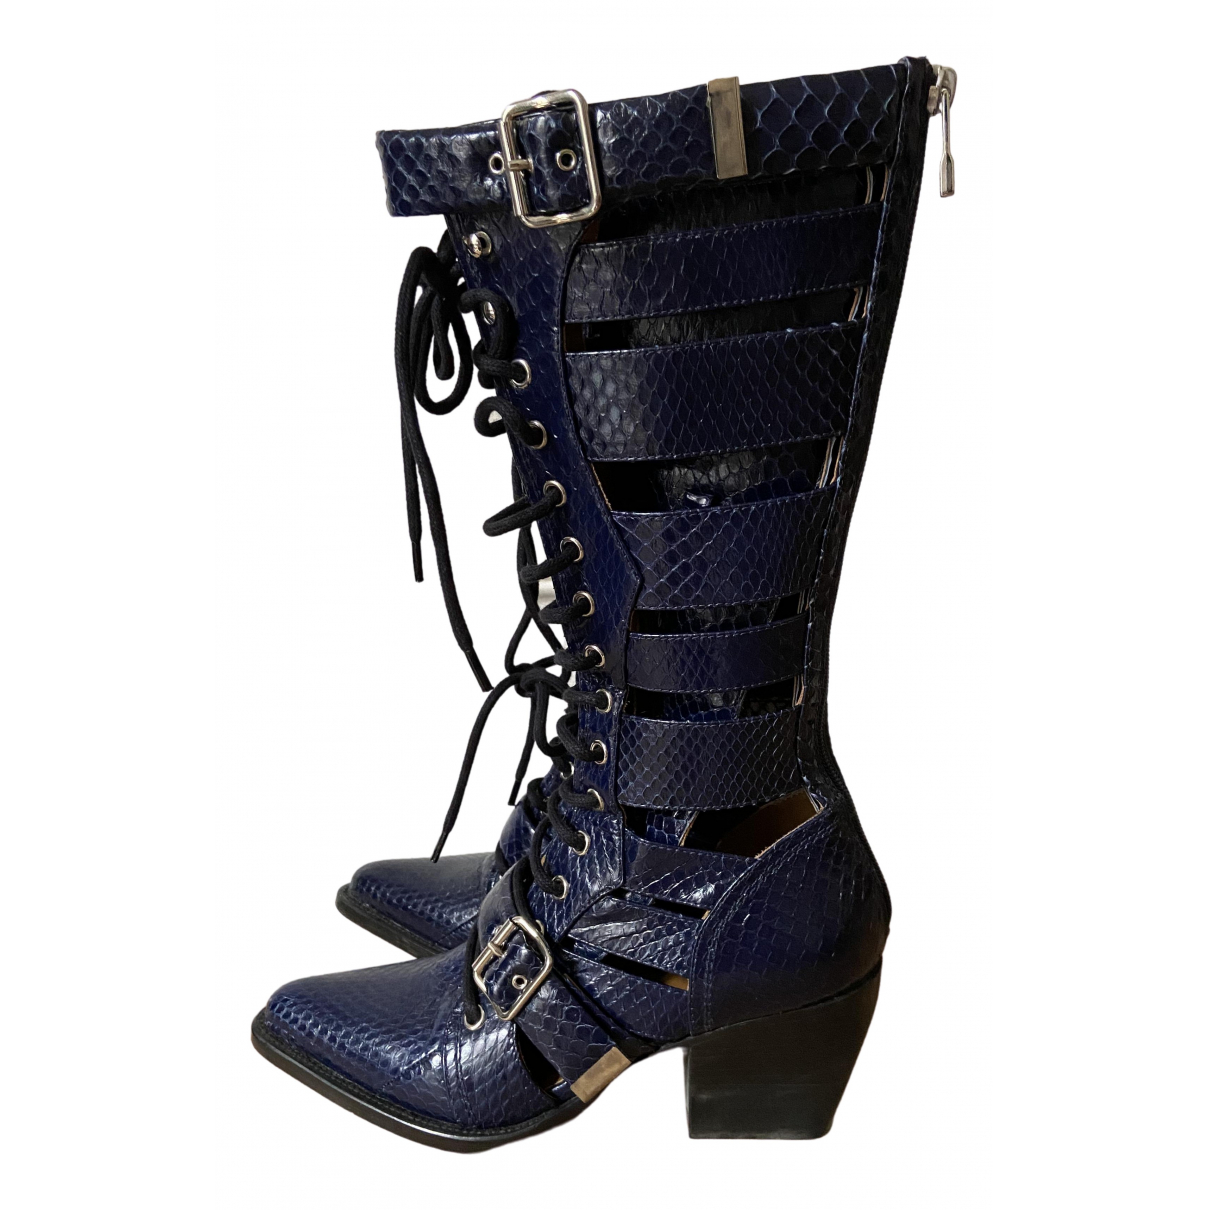 Chloe Rylee Stiefeletten in  Blau Lackleder